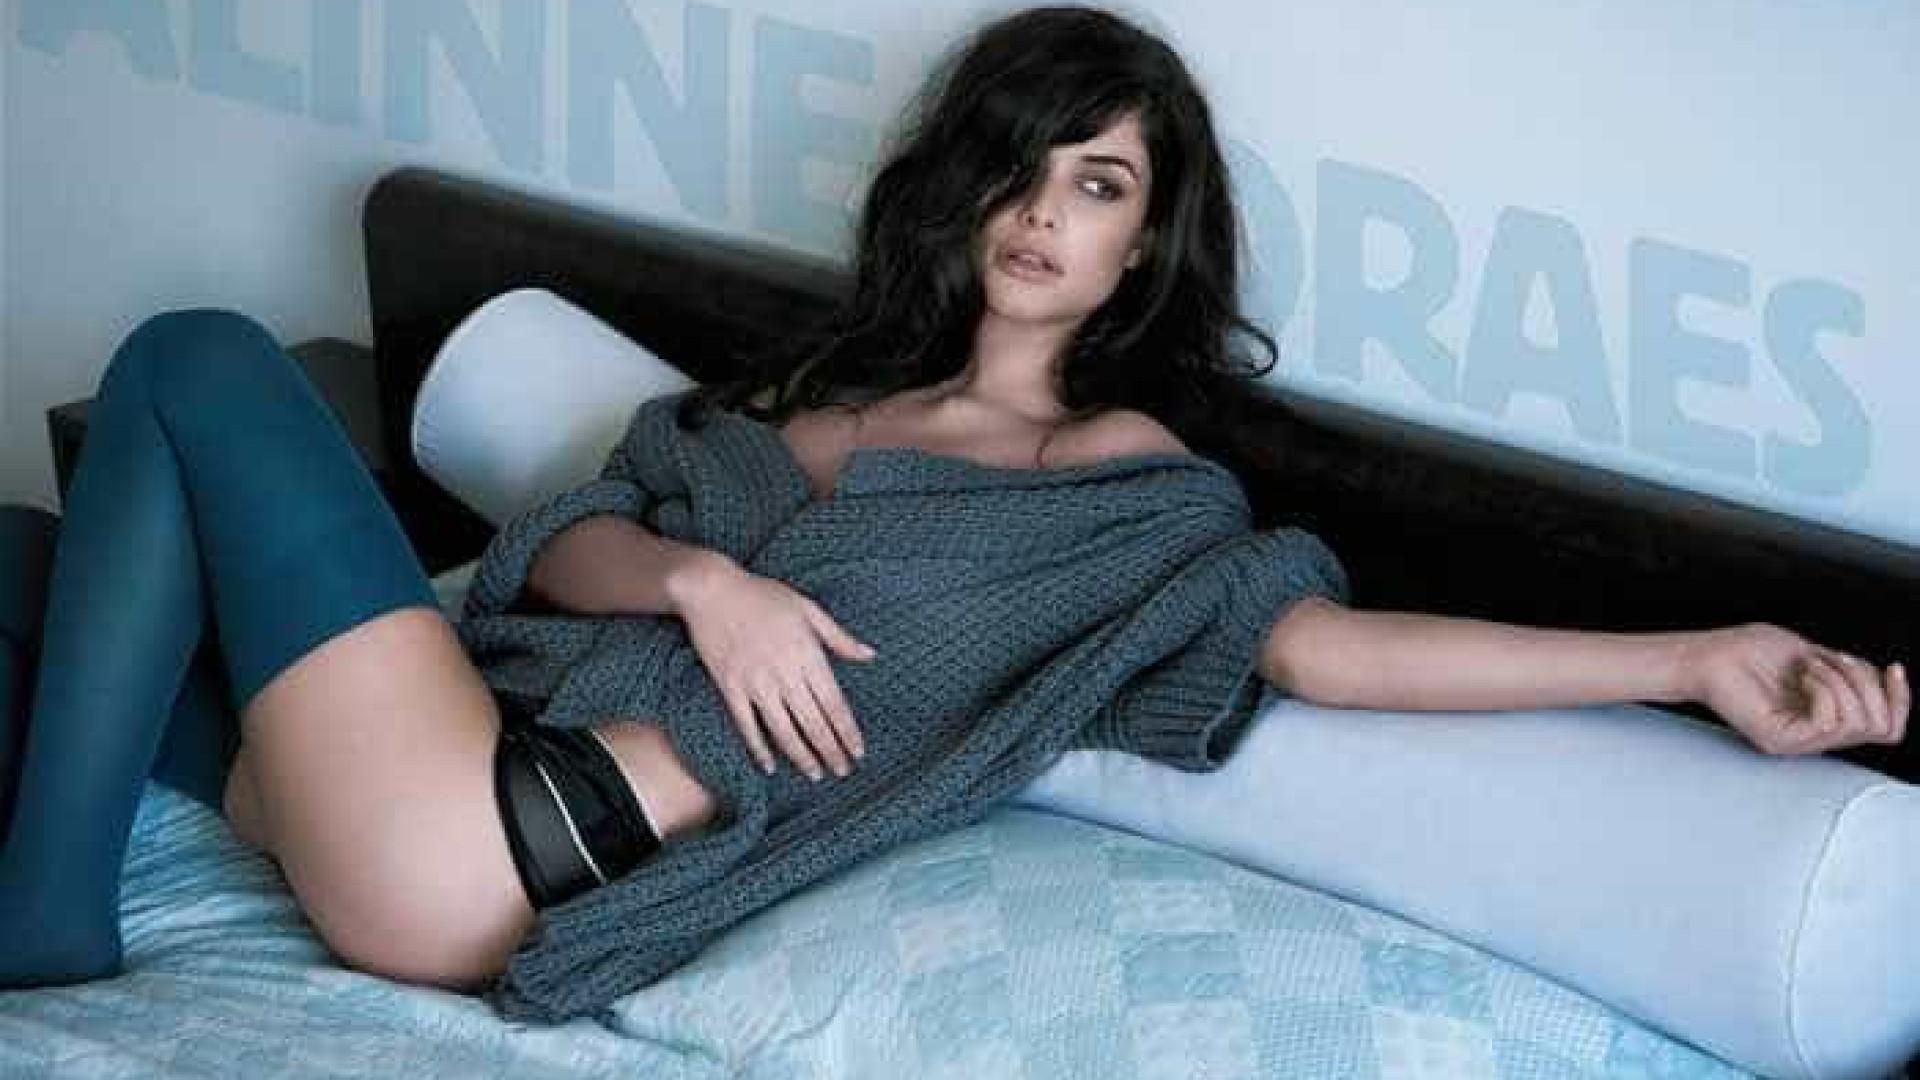 100 Pictures of Alinne Moraes Playboy